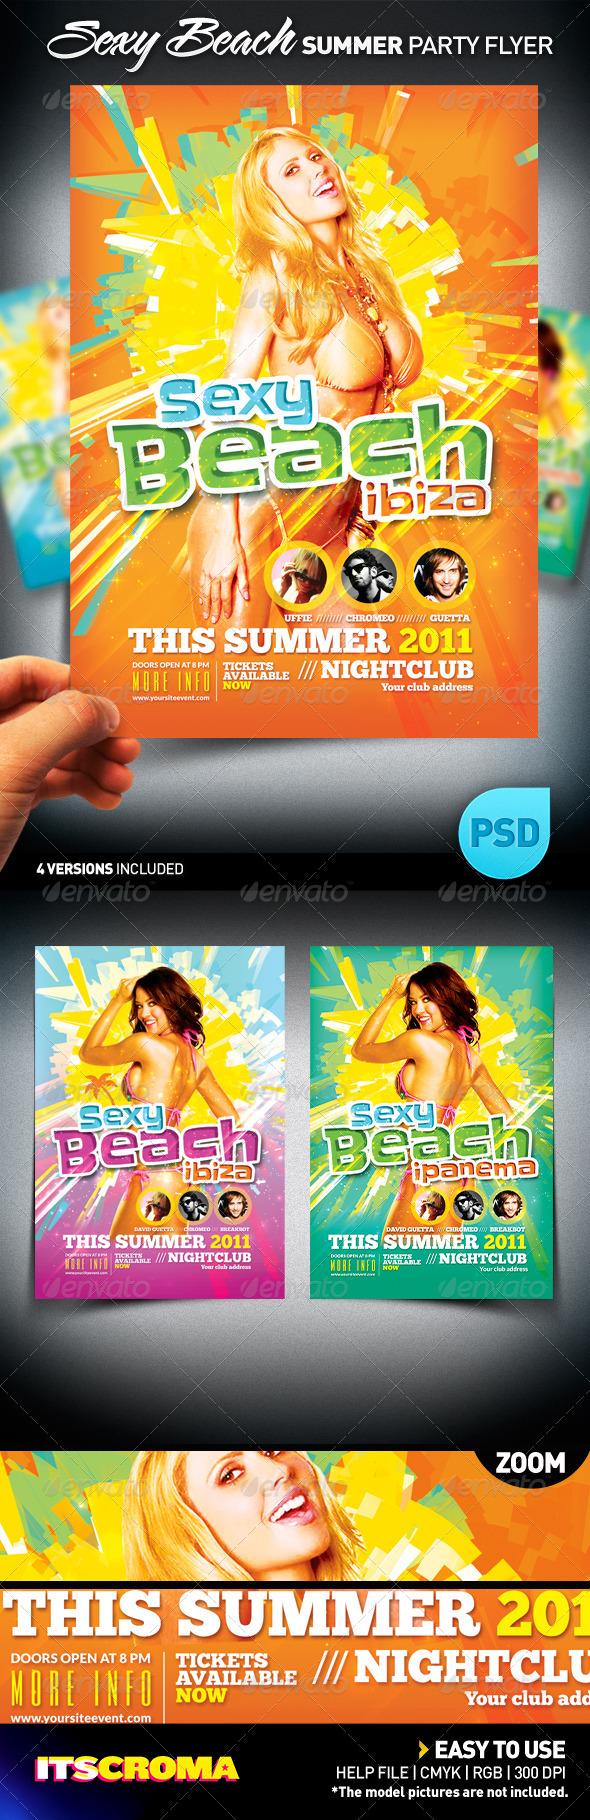 Sexy Beach Summer Party / Flyer